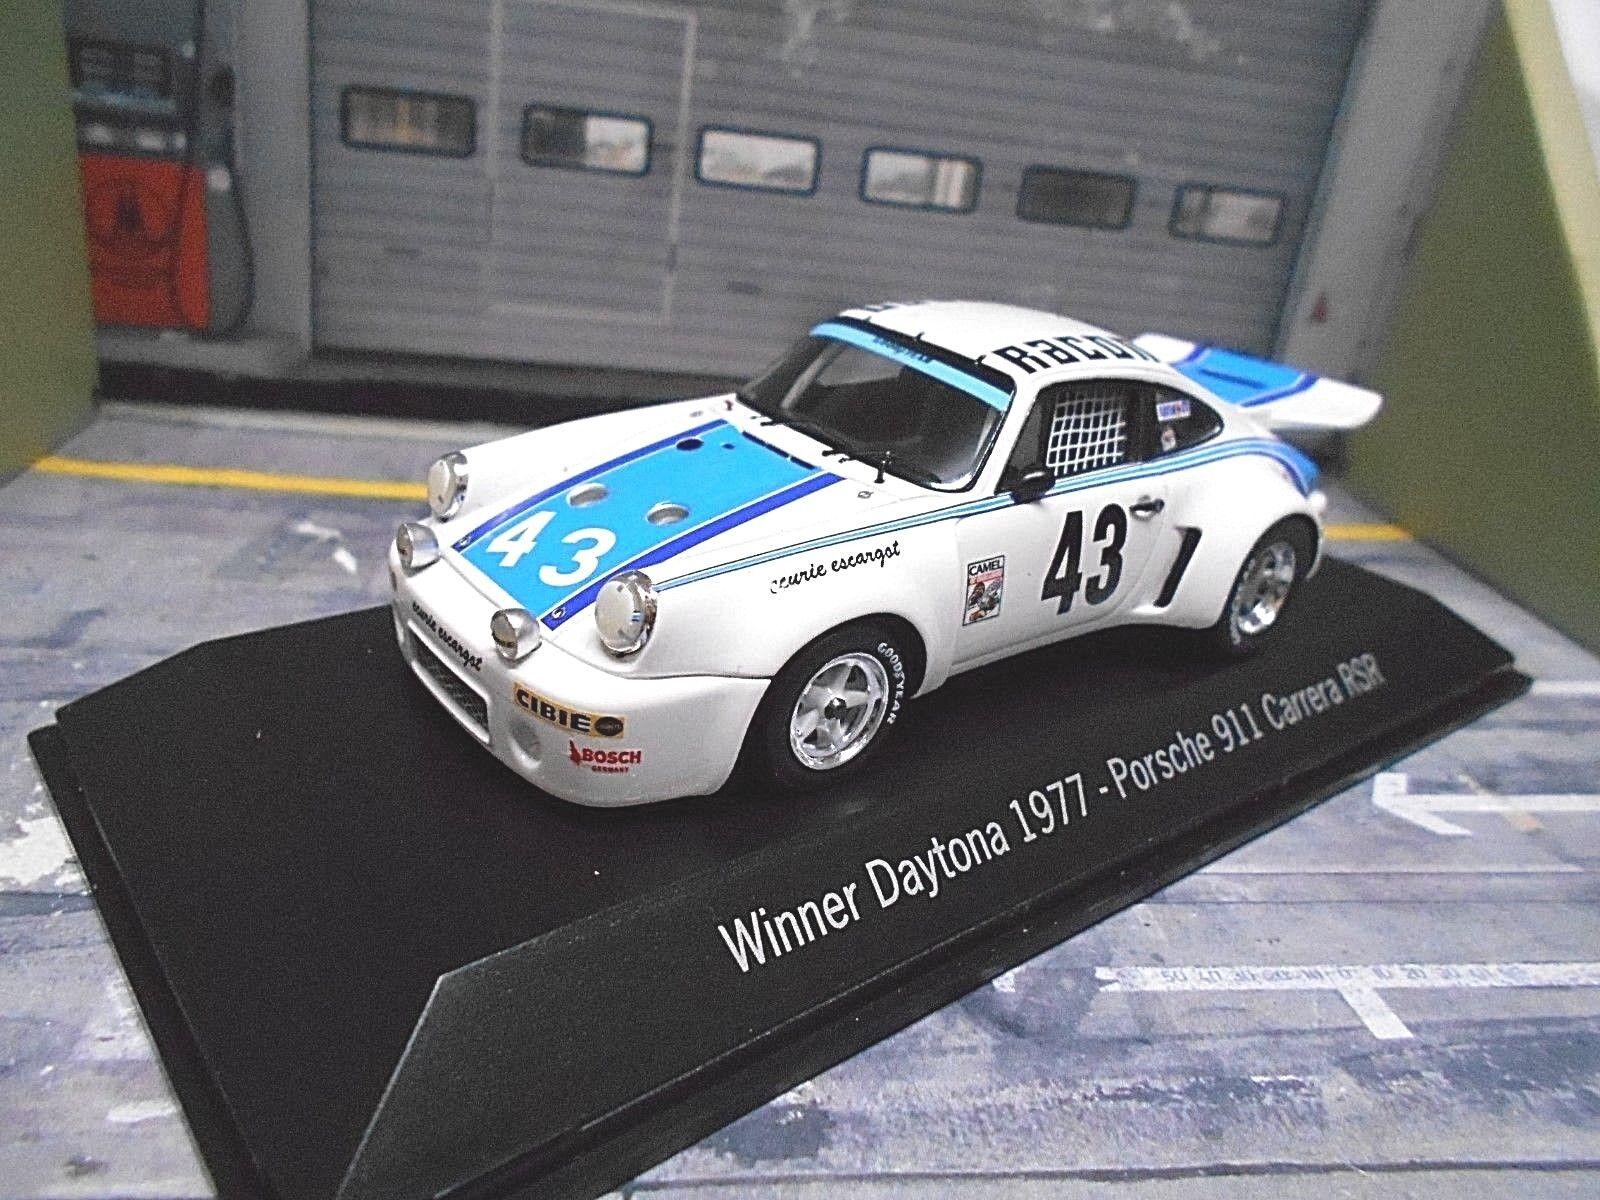 PORSCHE 911 Carrera RSR RSR RSR 3.0 DAYTONA 1977  43 vincitore Gregg Hurley resi SPARK 1 43 97f230